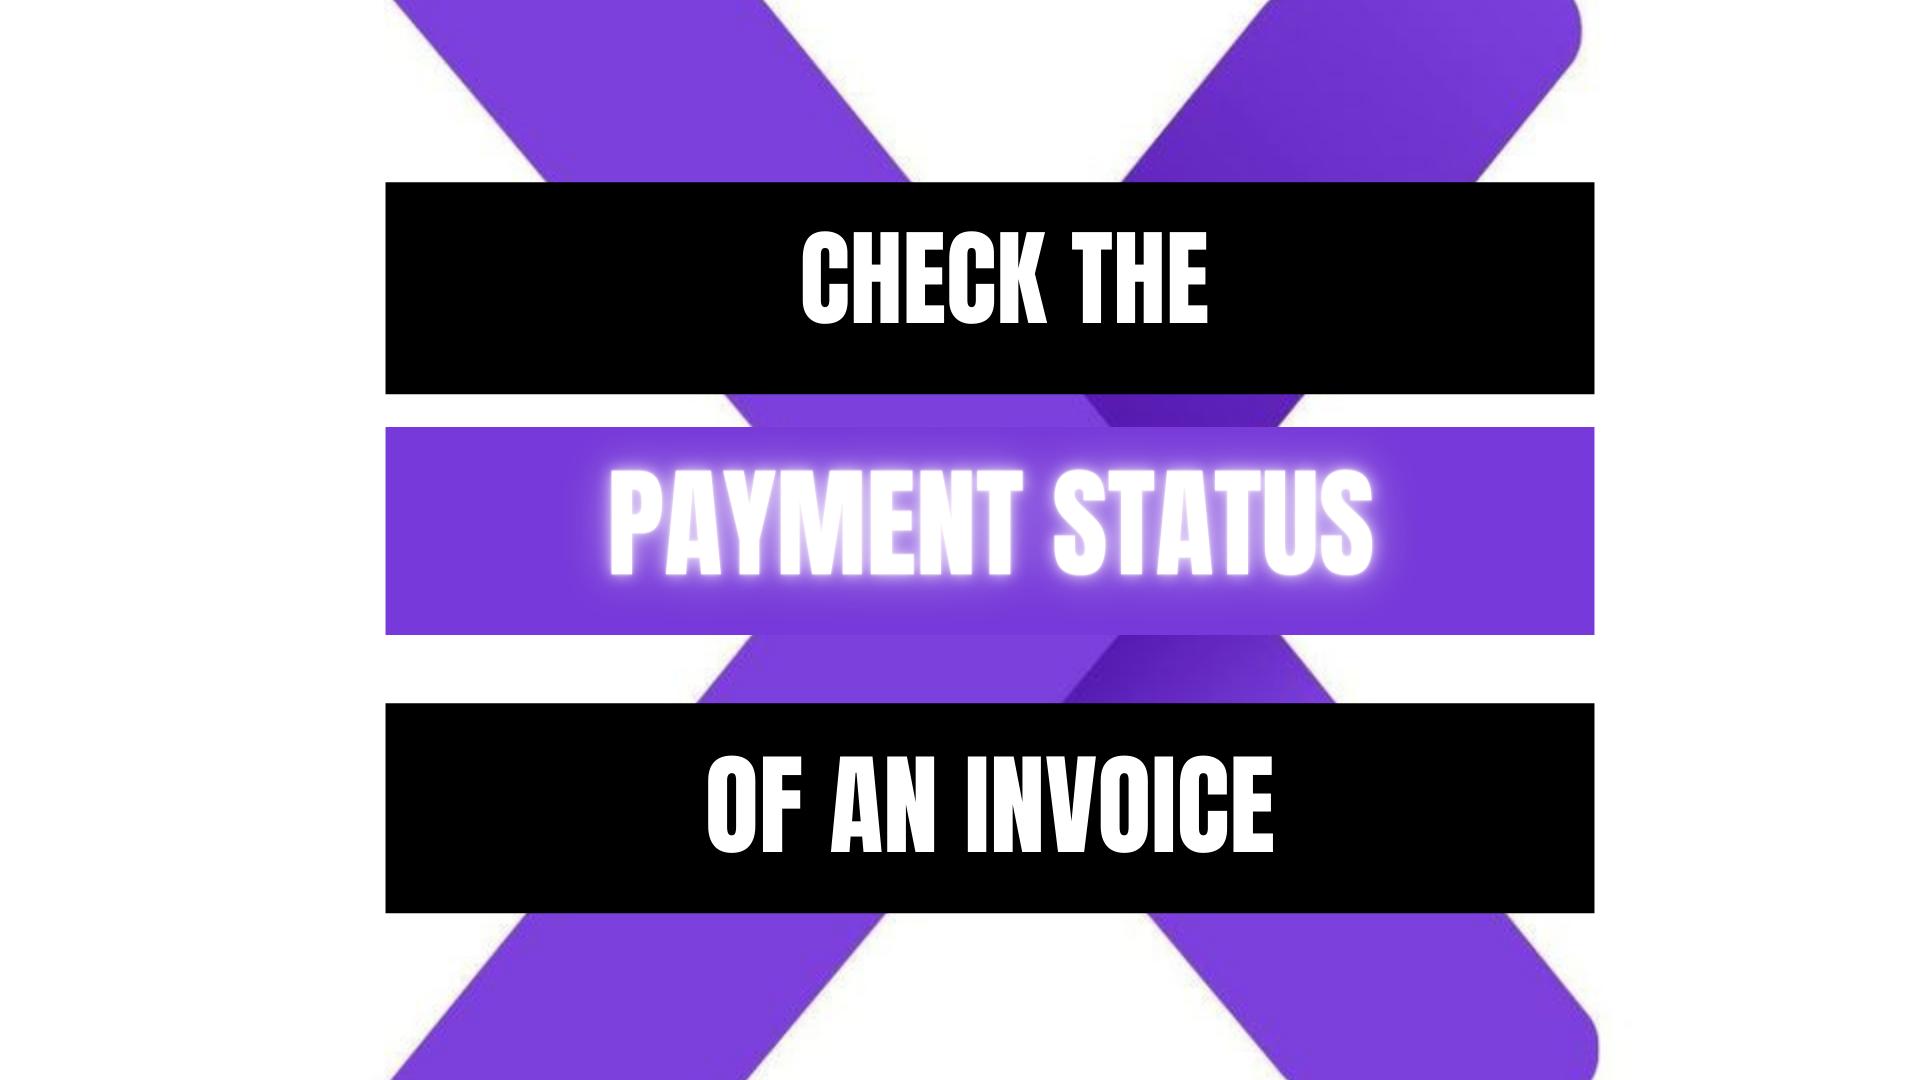 Peekaboox - Check Payment Status